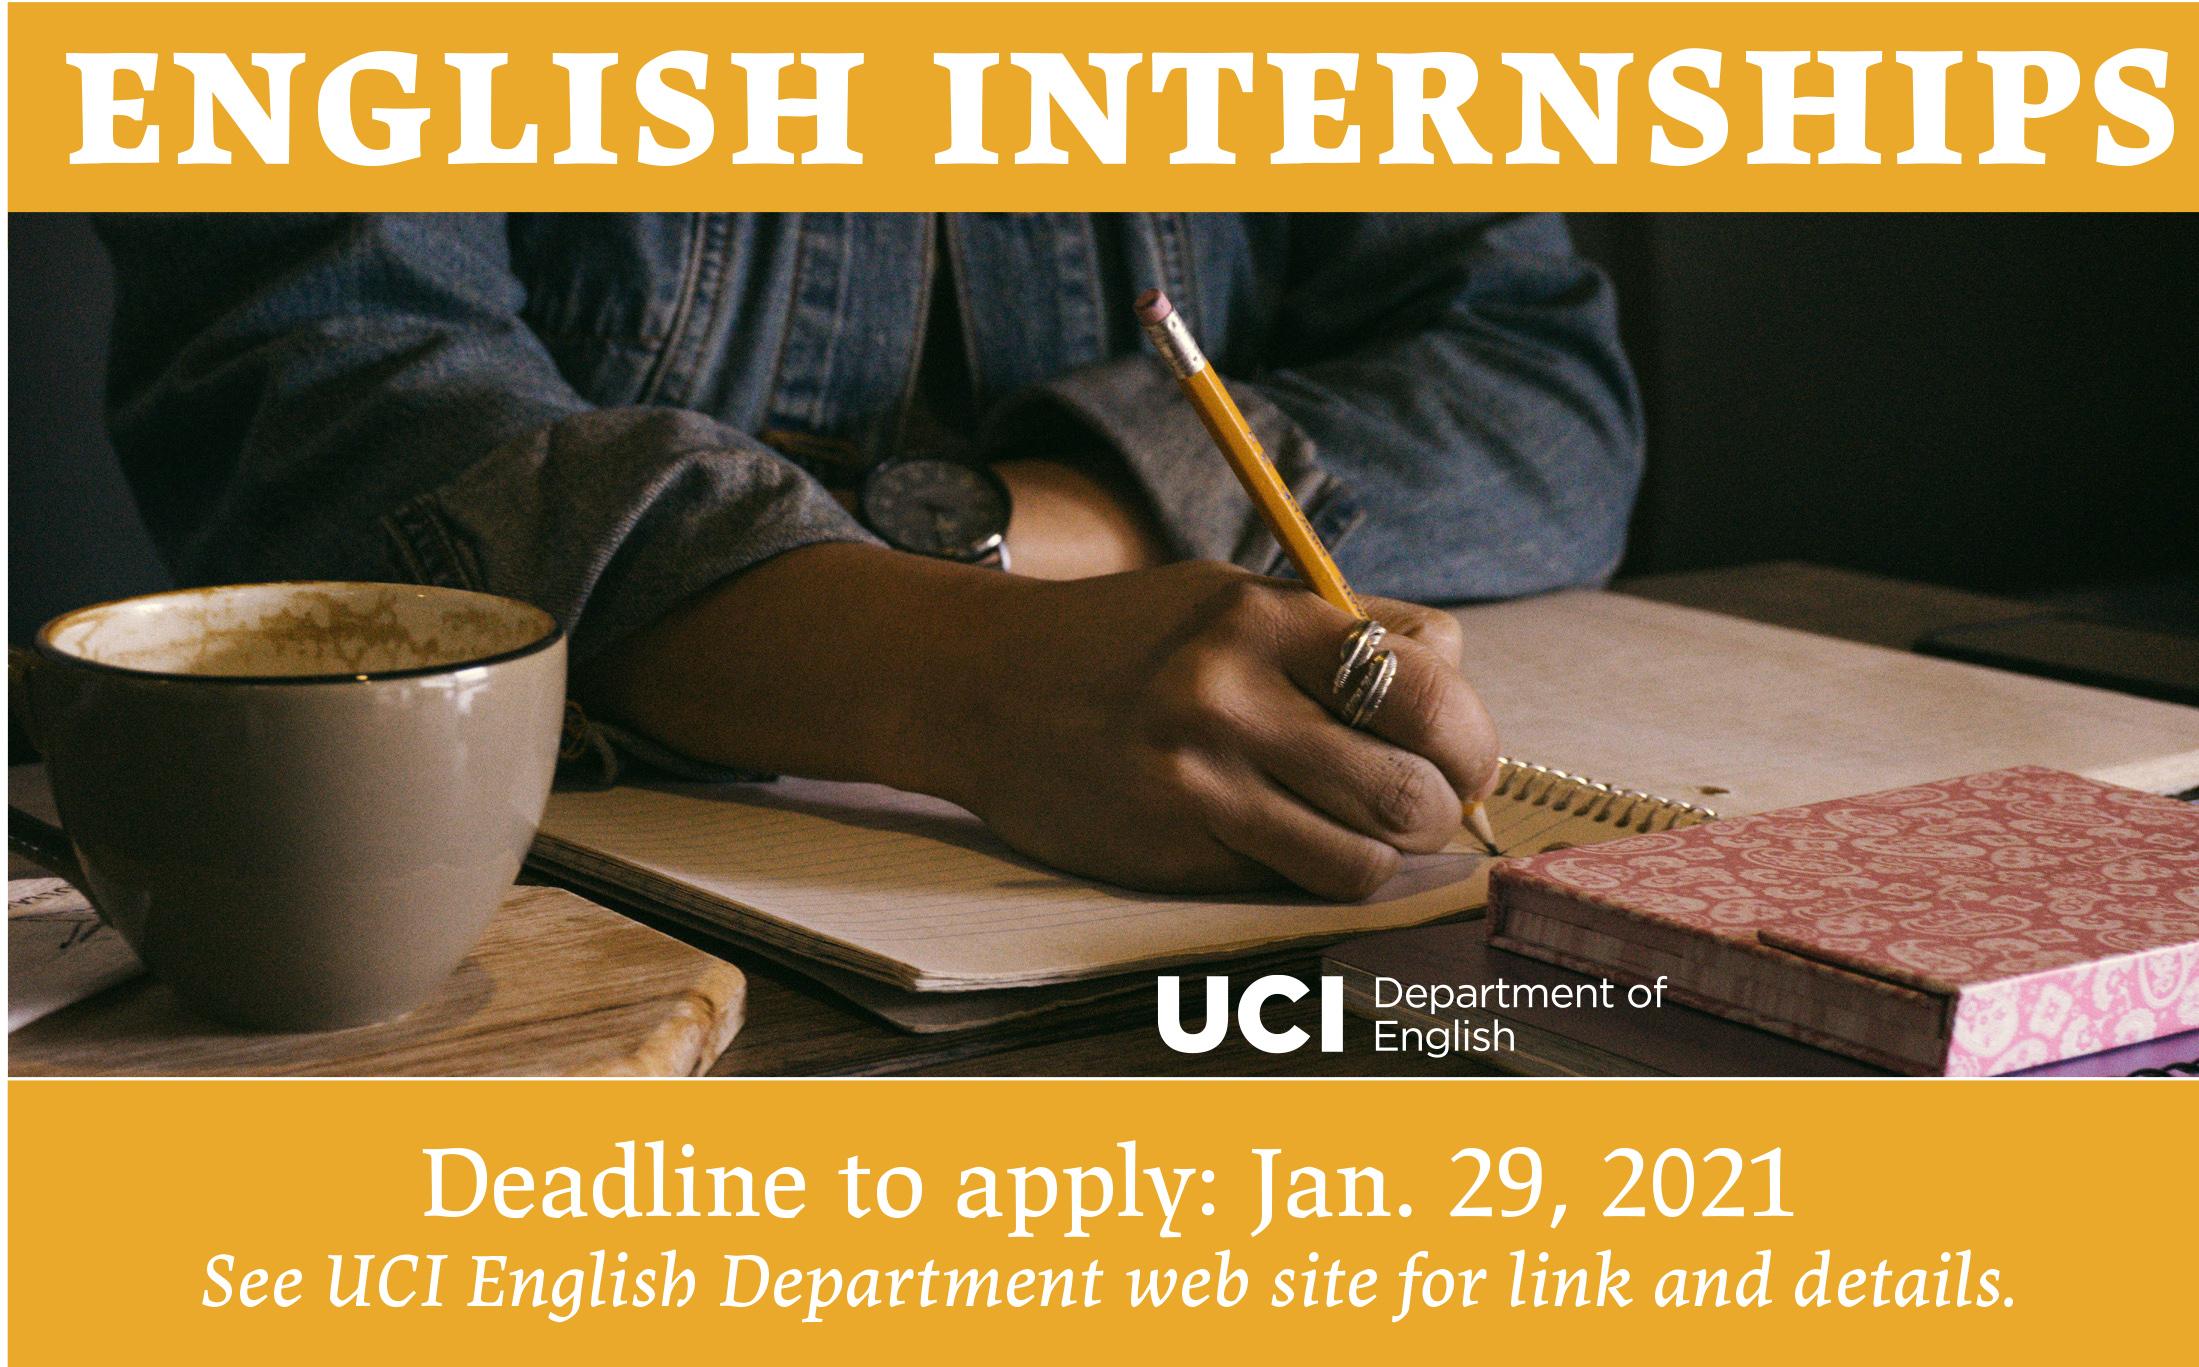 English Internships Deadline Feb. 12 2021